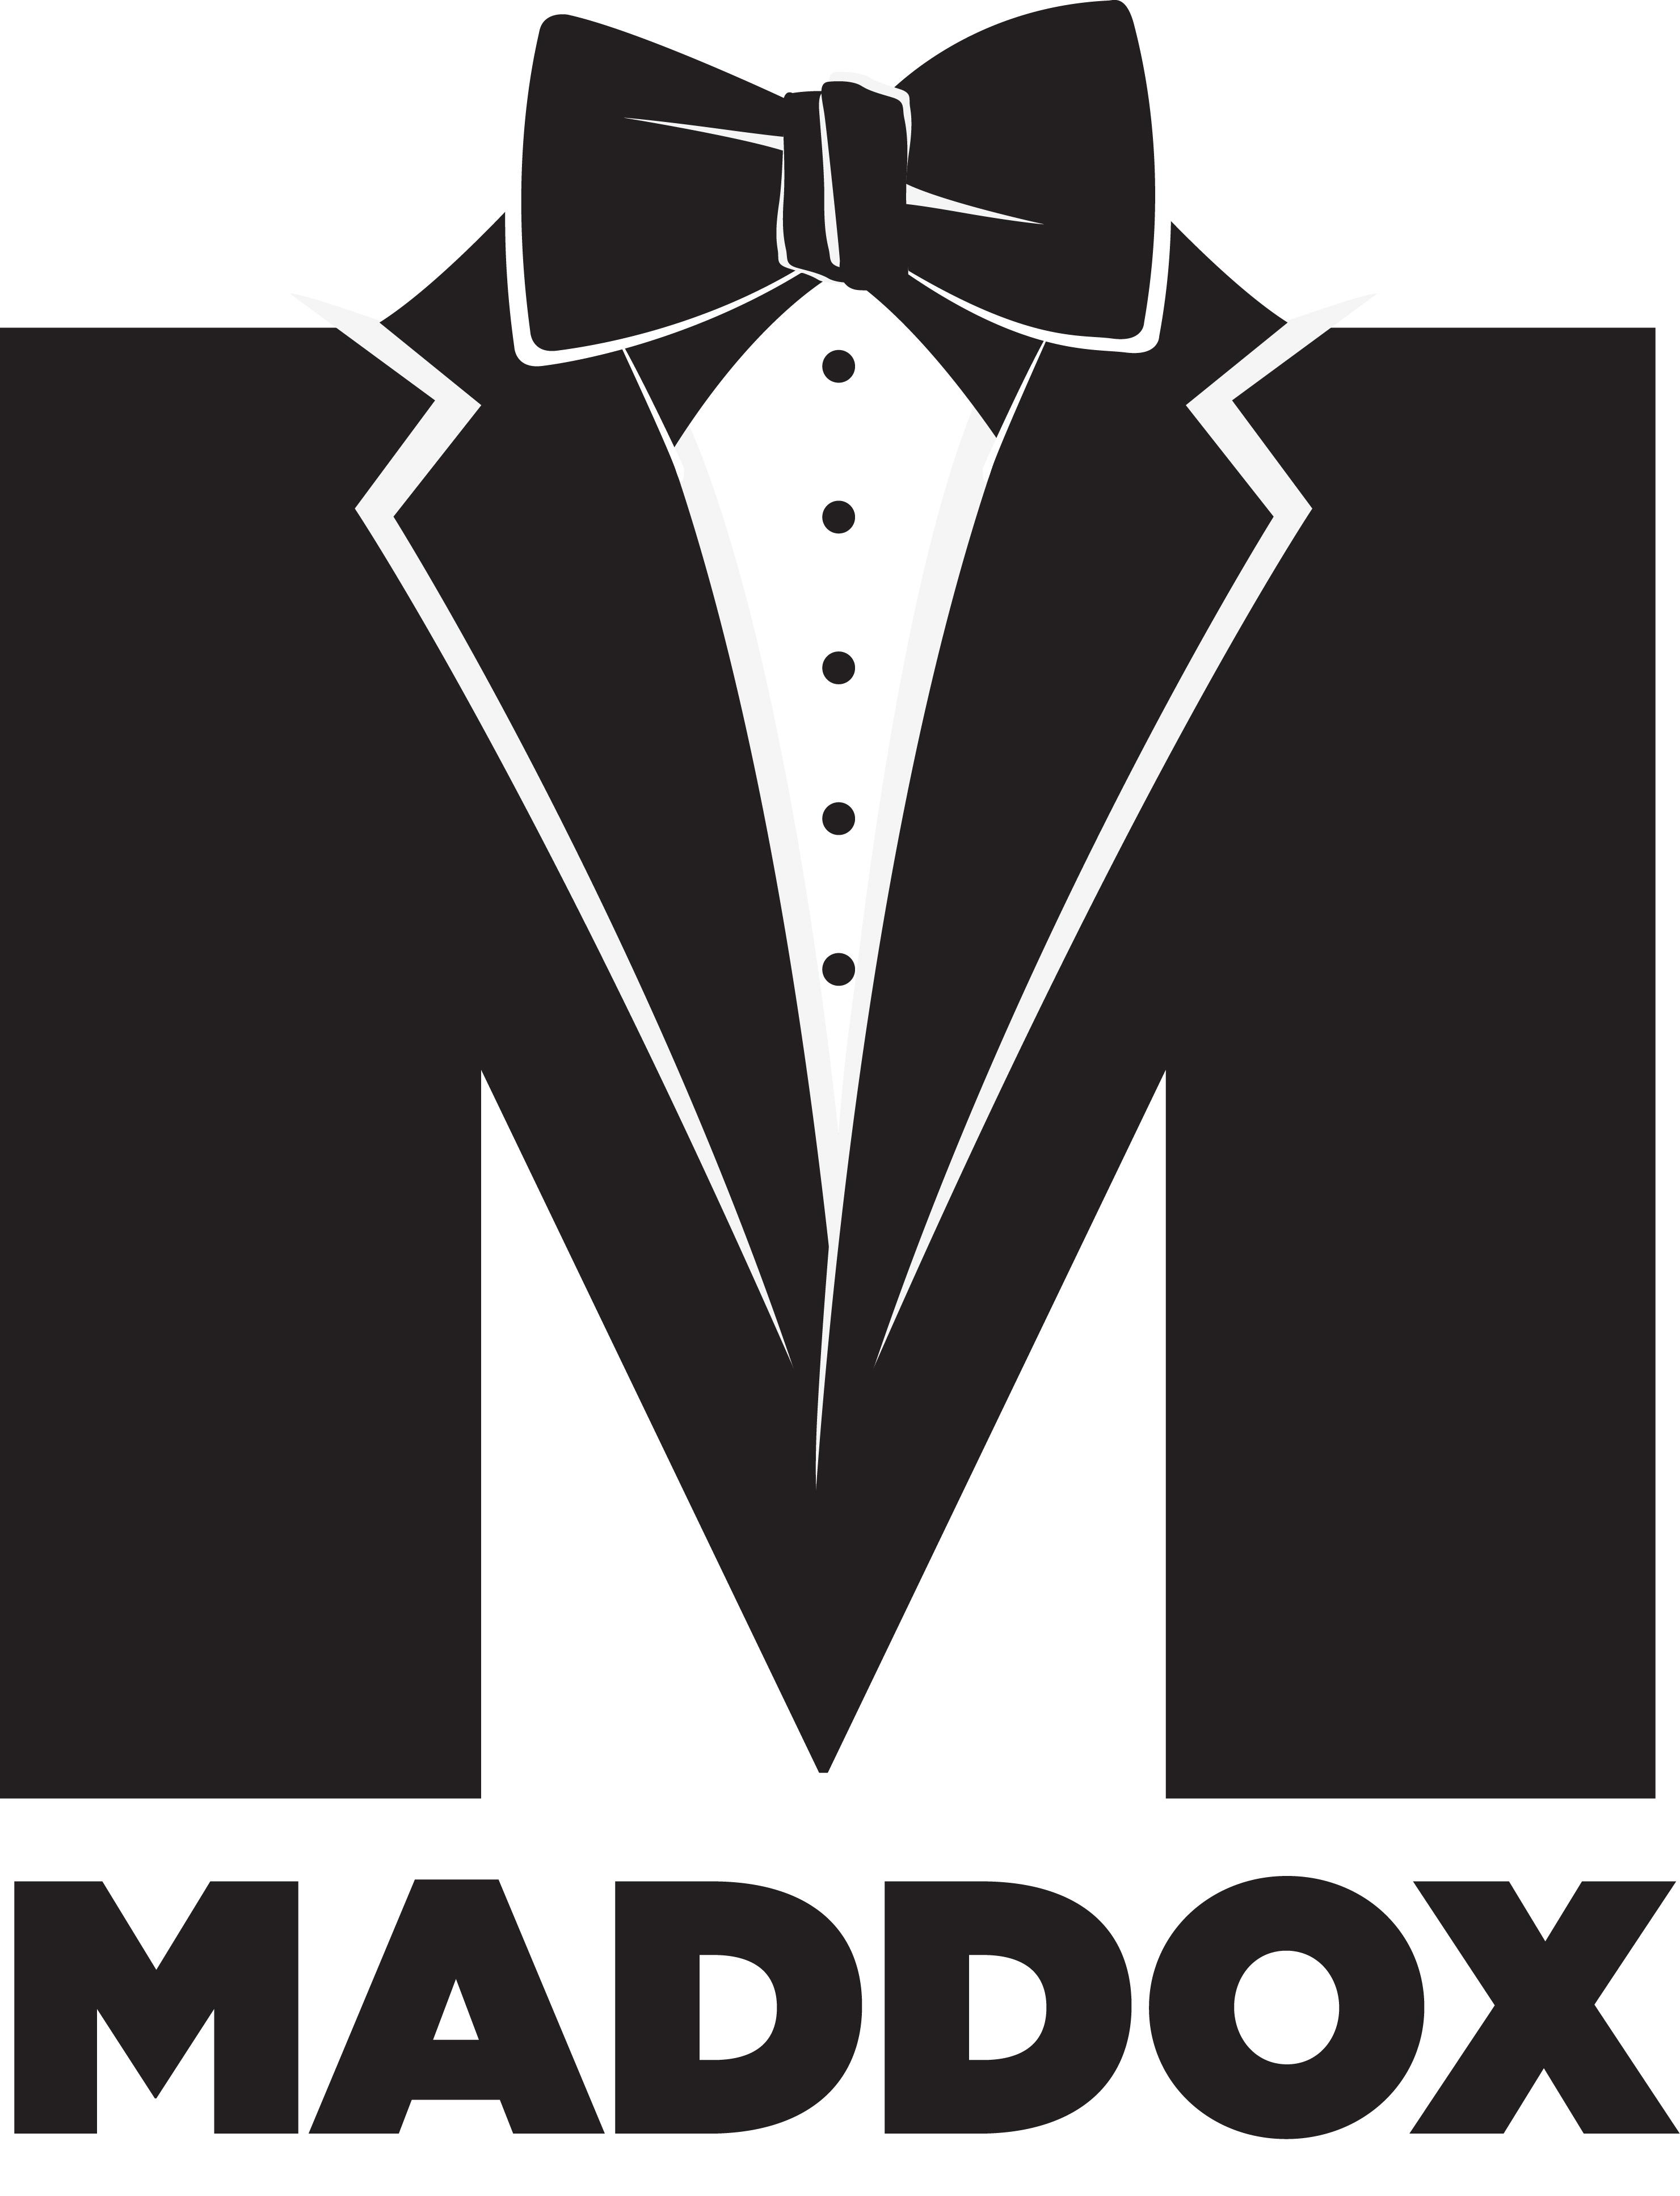 MADDOX LARGE